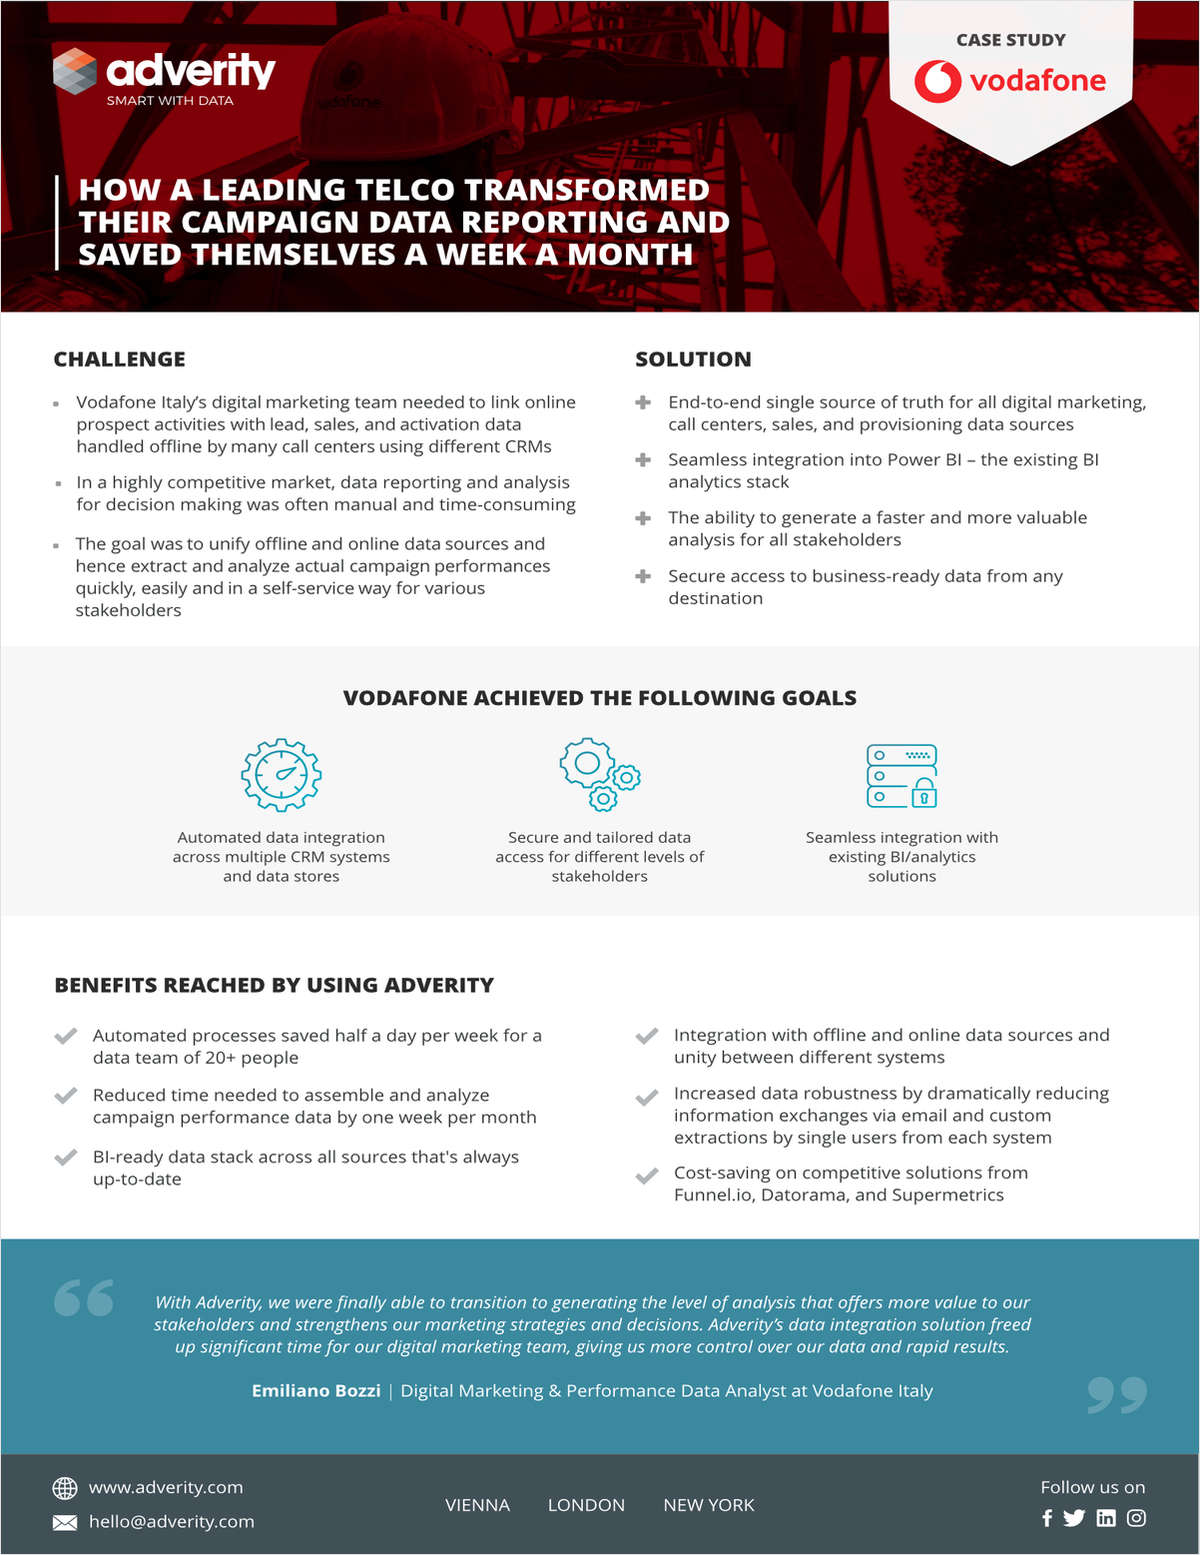 Vodafone Italy Case Study